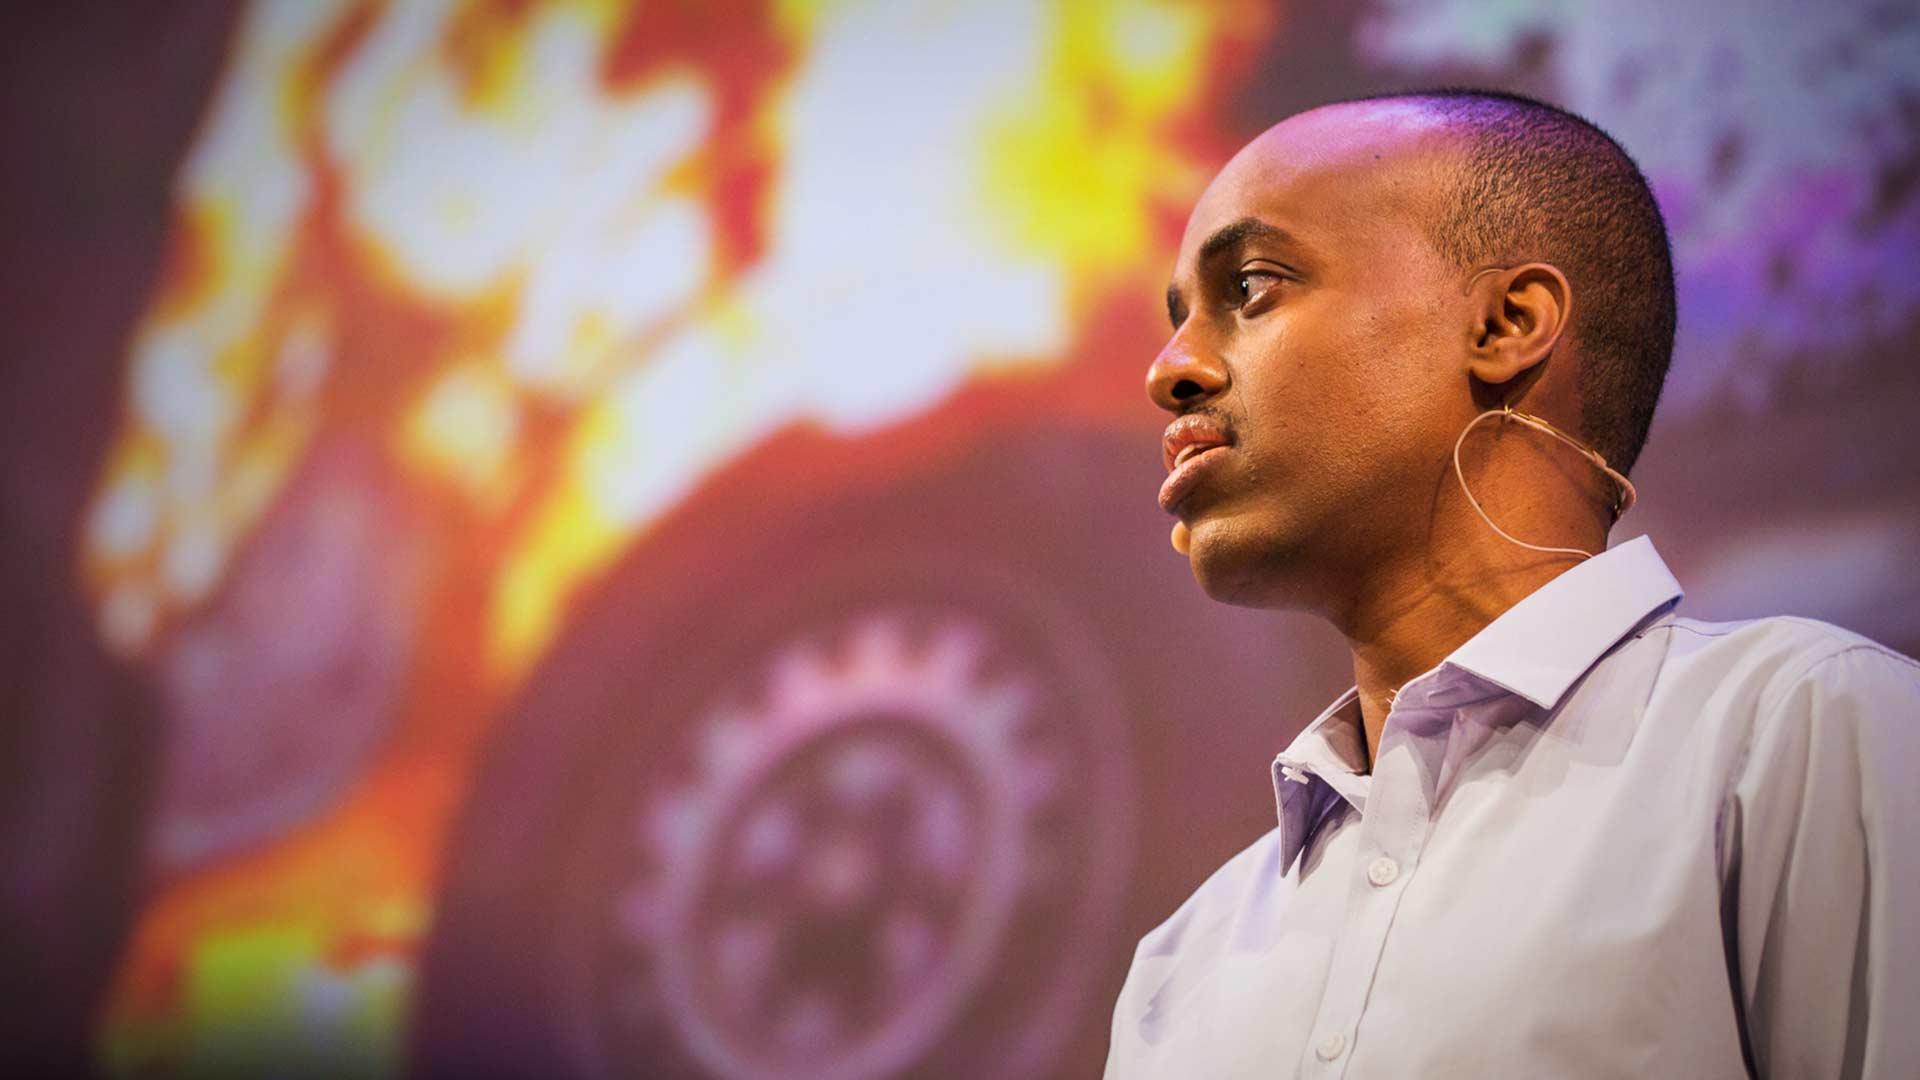 Peace strategist Mohamed Ali speaks at TEDCity2.0, bringing us to the city of Mogadishu. Photo: Ryan Lash